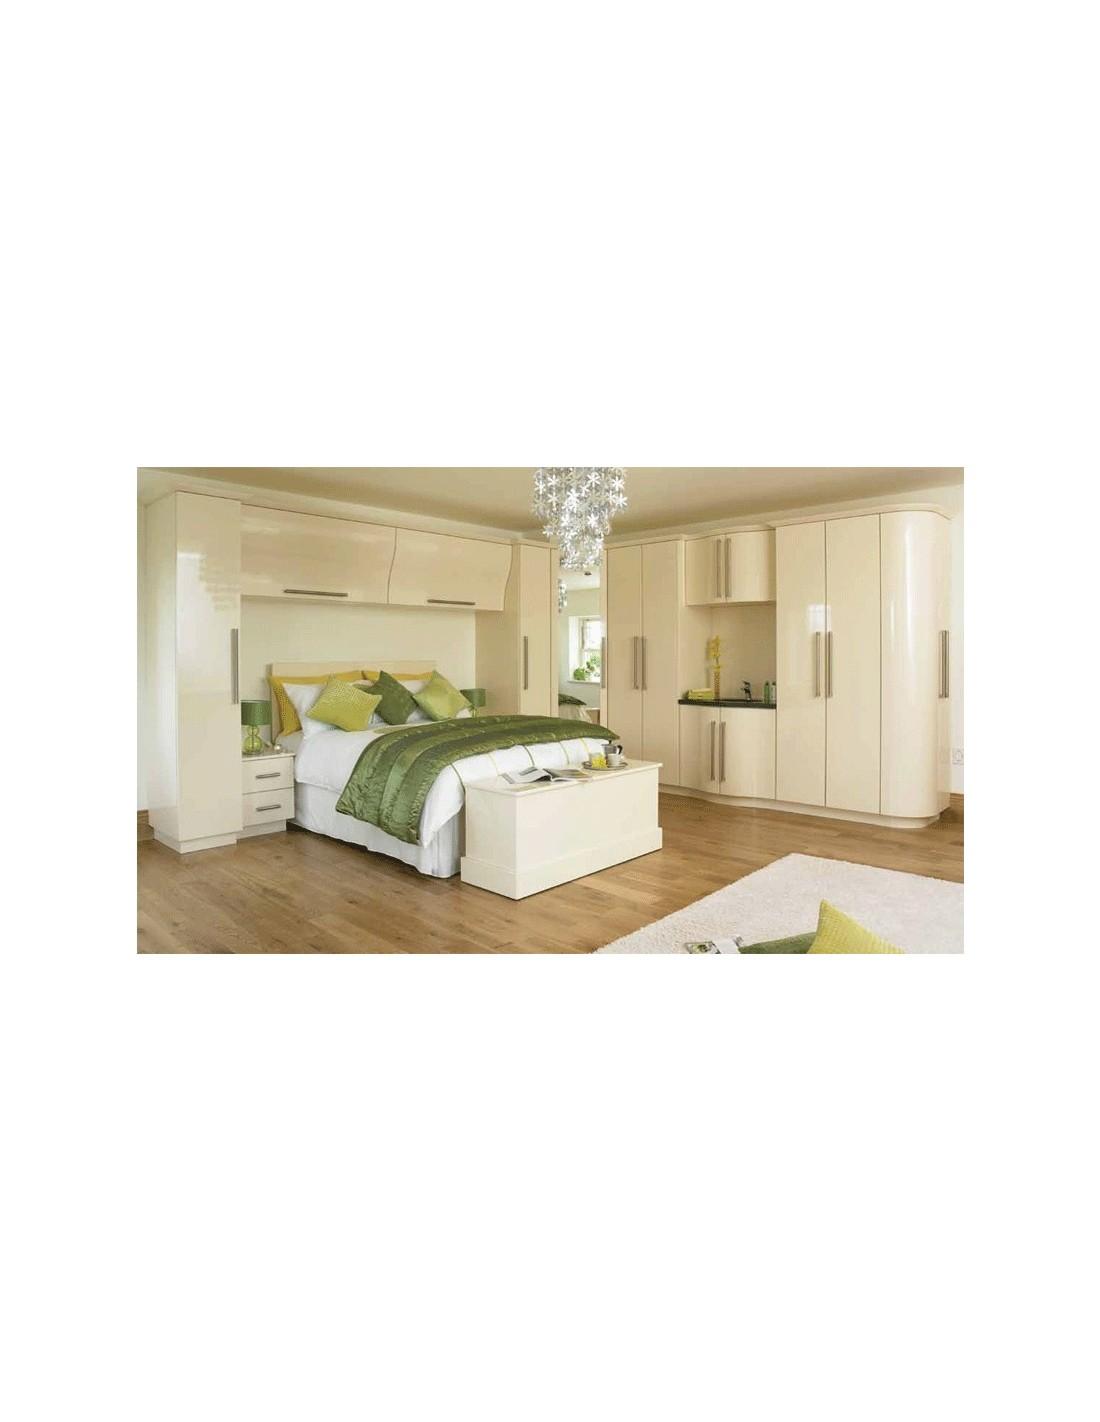 duleek cream high gloss bedroom doors units east coast kitchens. Black Bedroom Furniture Sets. Home Design Ideas